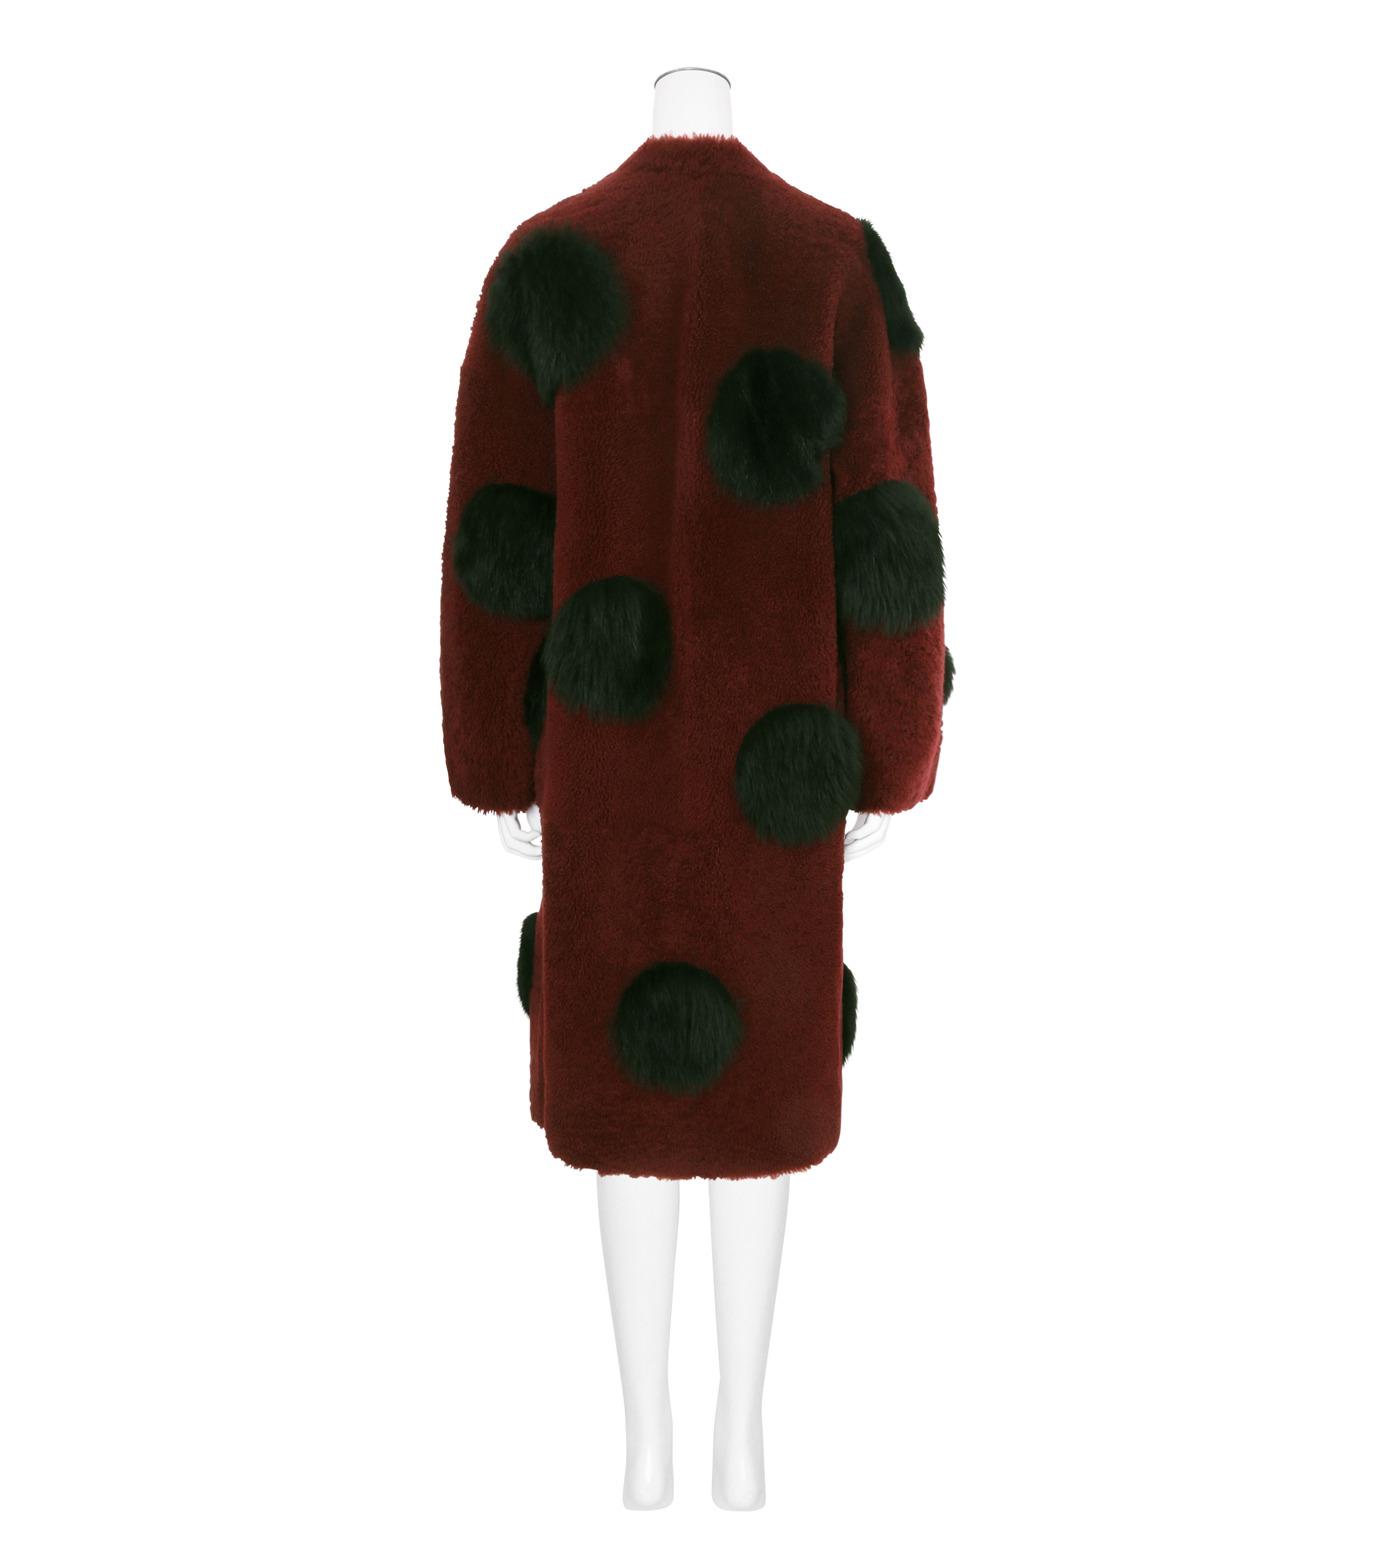 ANNE VEST(アンベスト)のLayla Coat w/Dots Reversible-BORDEAUX-AW160121017-63 拡大詳細画像2